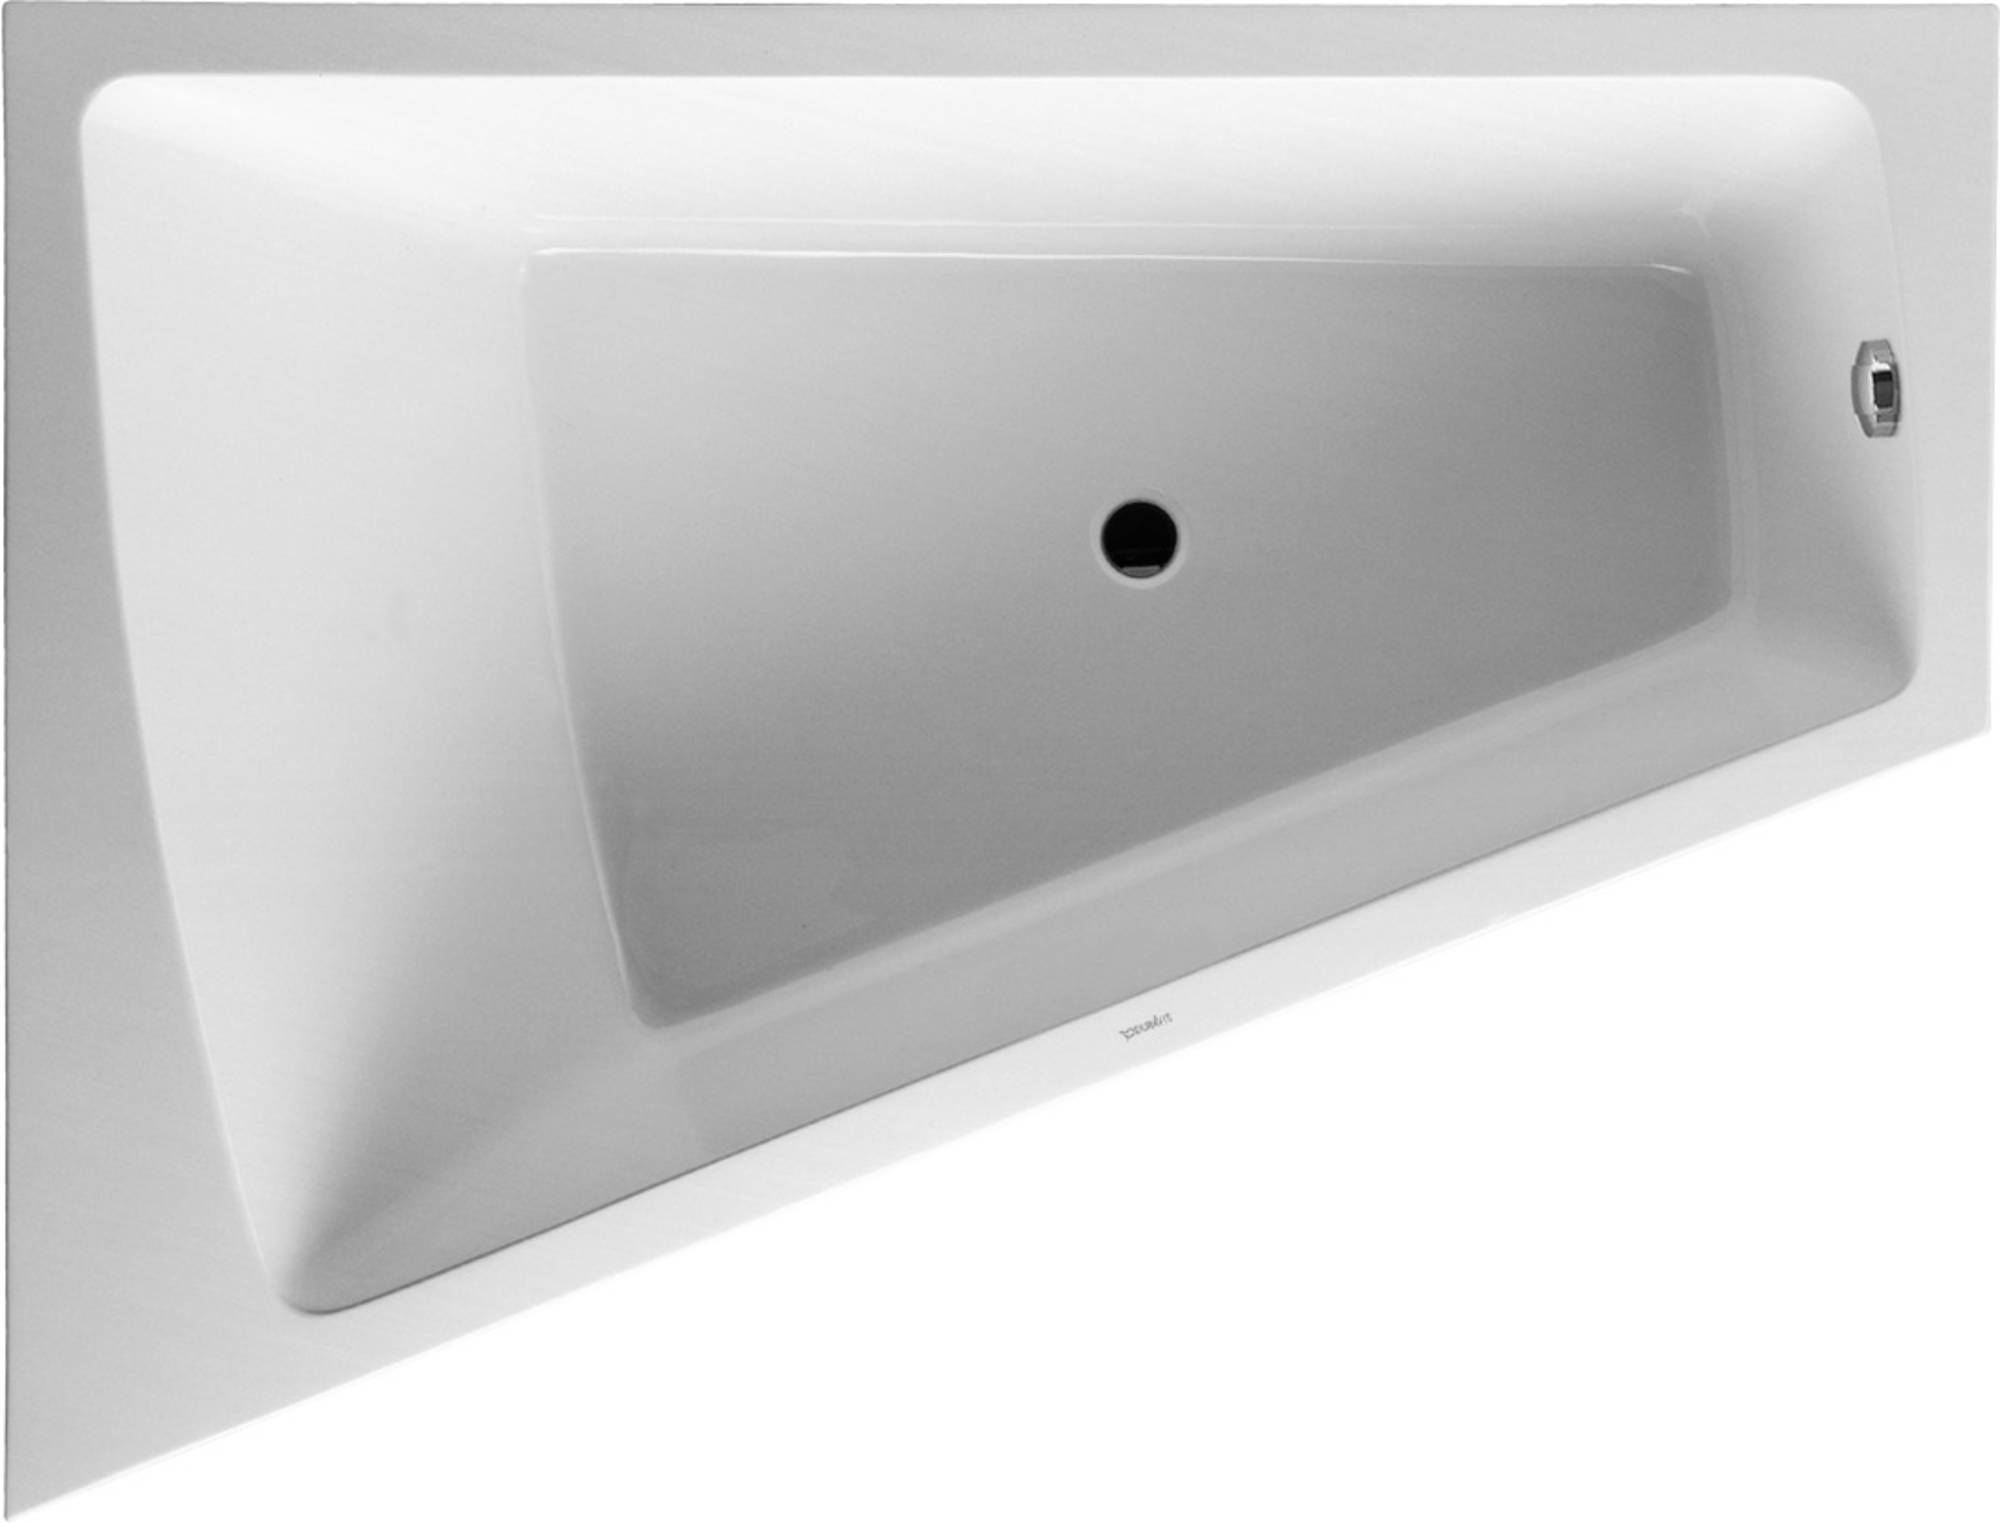 Duravit Paiova kunststof bad acryl afgeschuind links m. aangevormd paneel 180x140x46cm m. frame wit